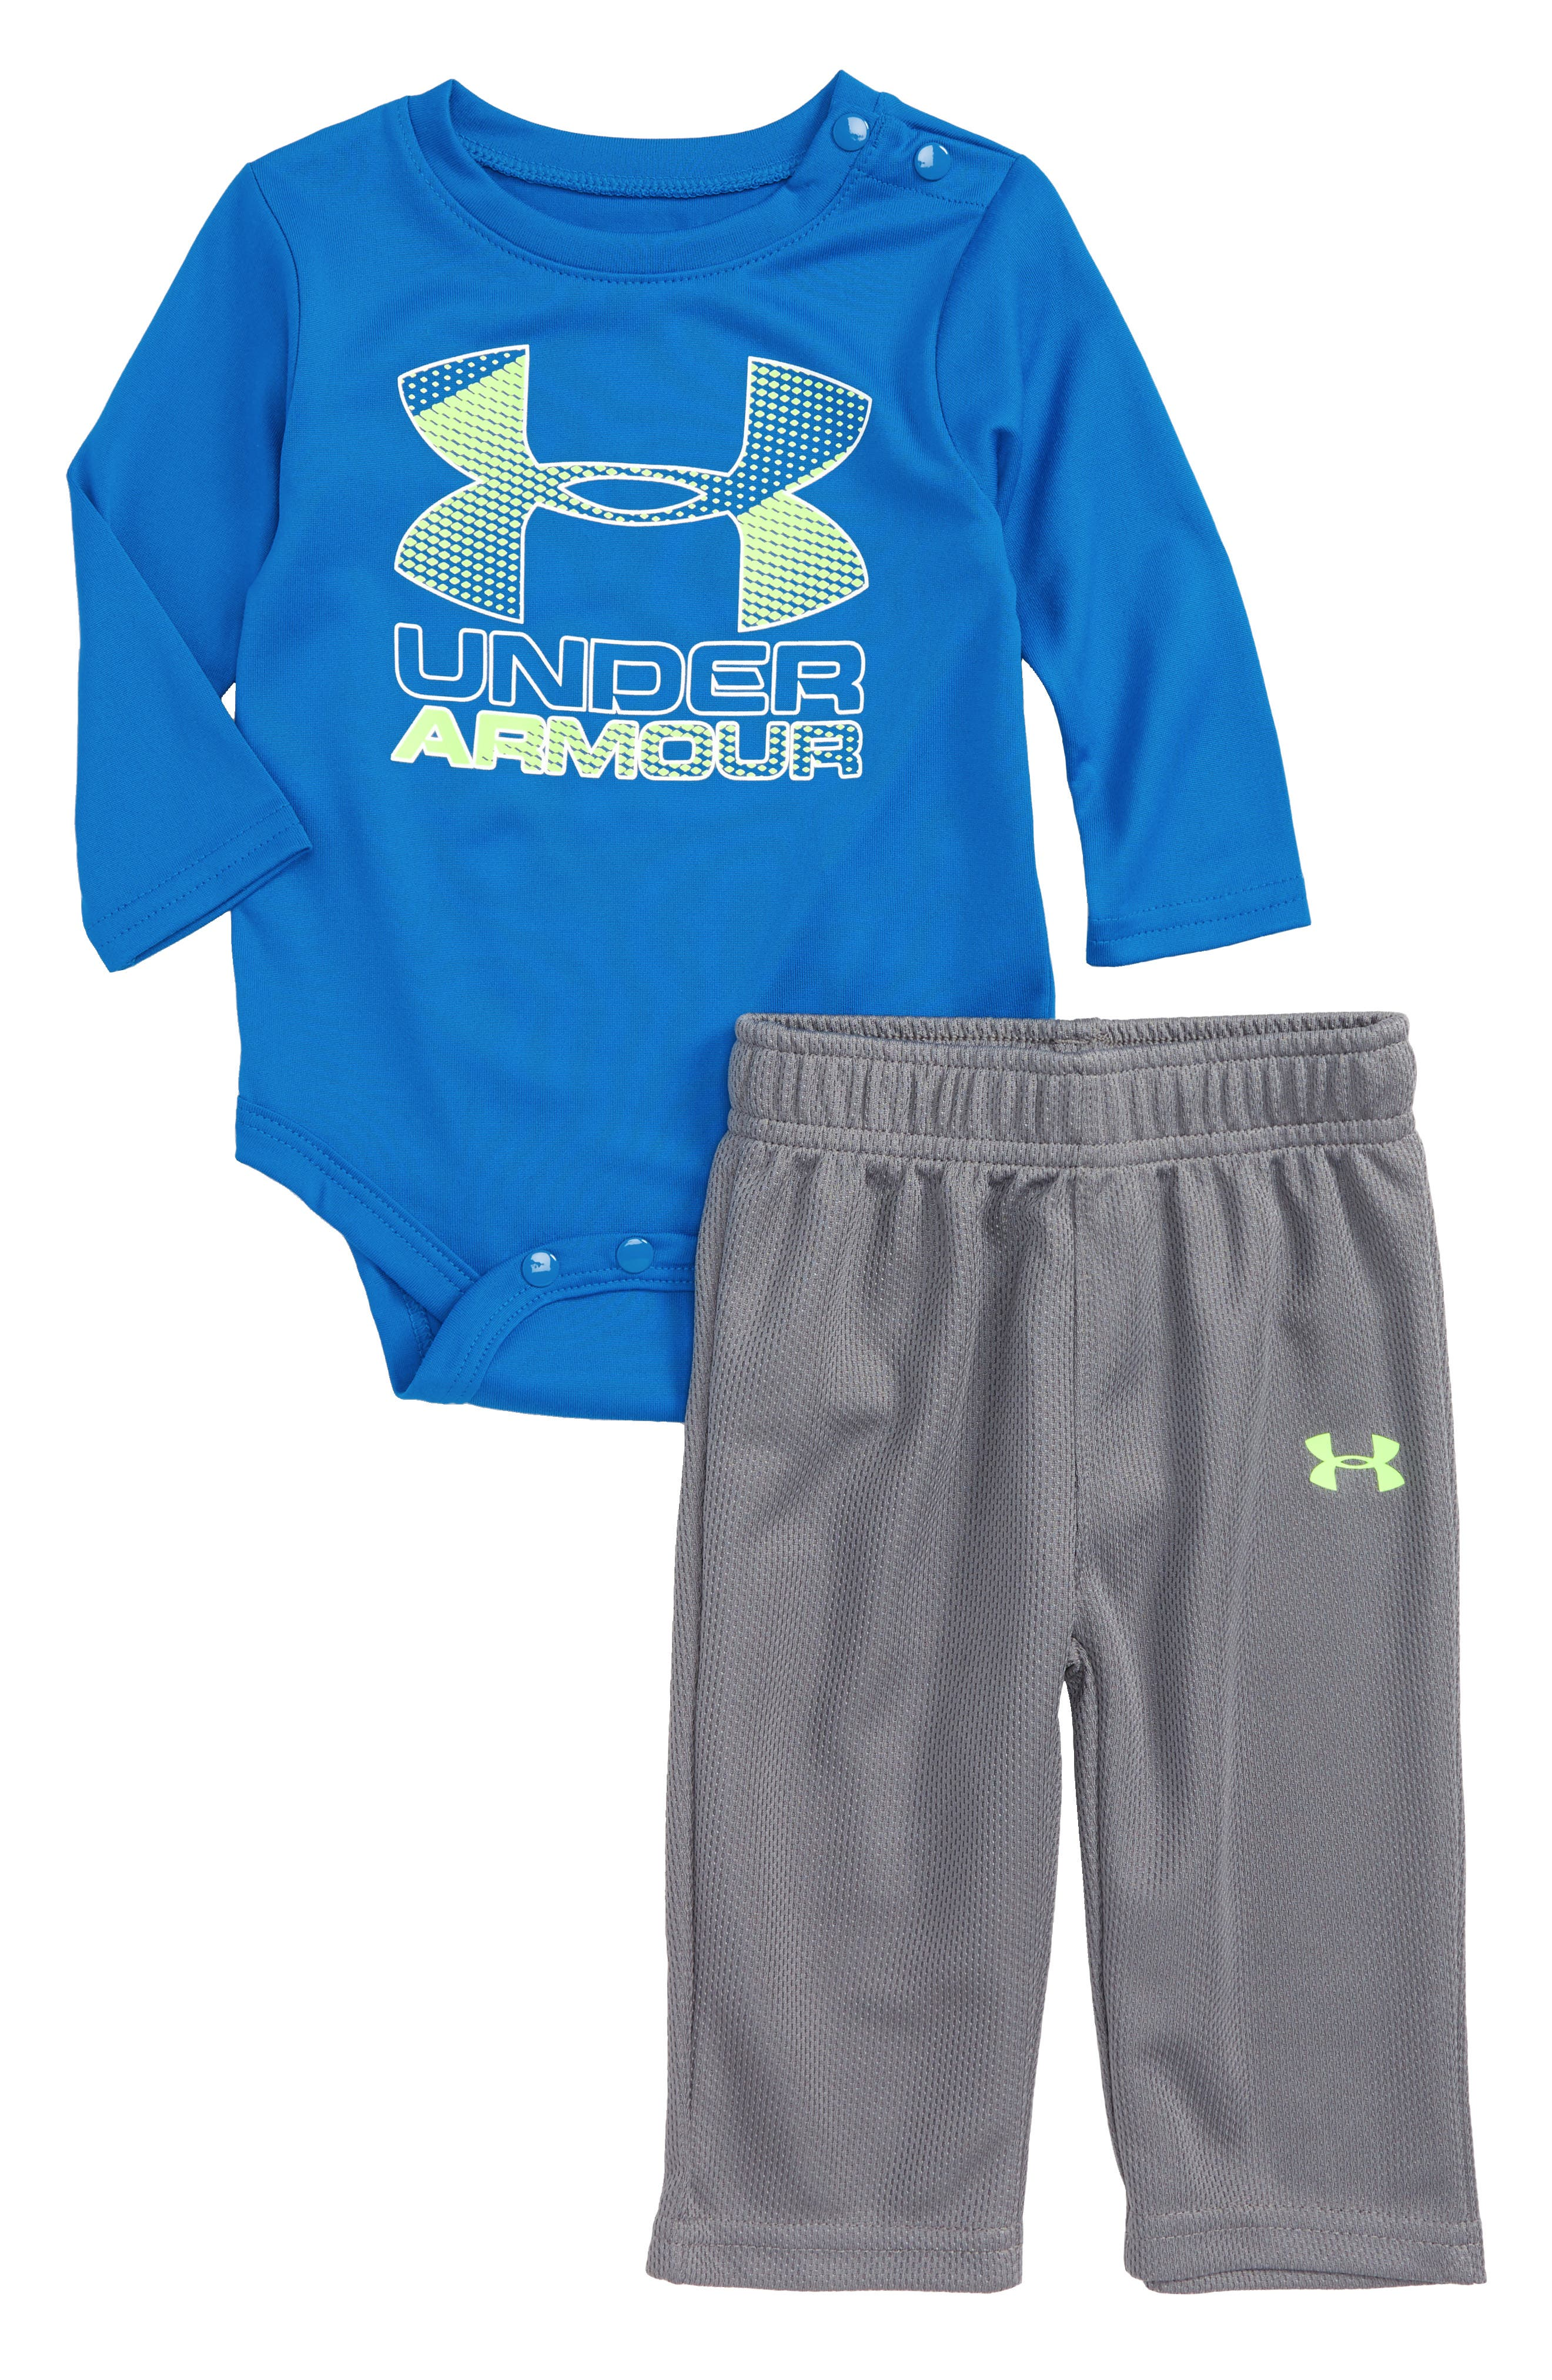 Alternate Image 1 Selected - Under Armour Hybrid Logo Graphic Bodysuit & Pants Set (Baby Boys)